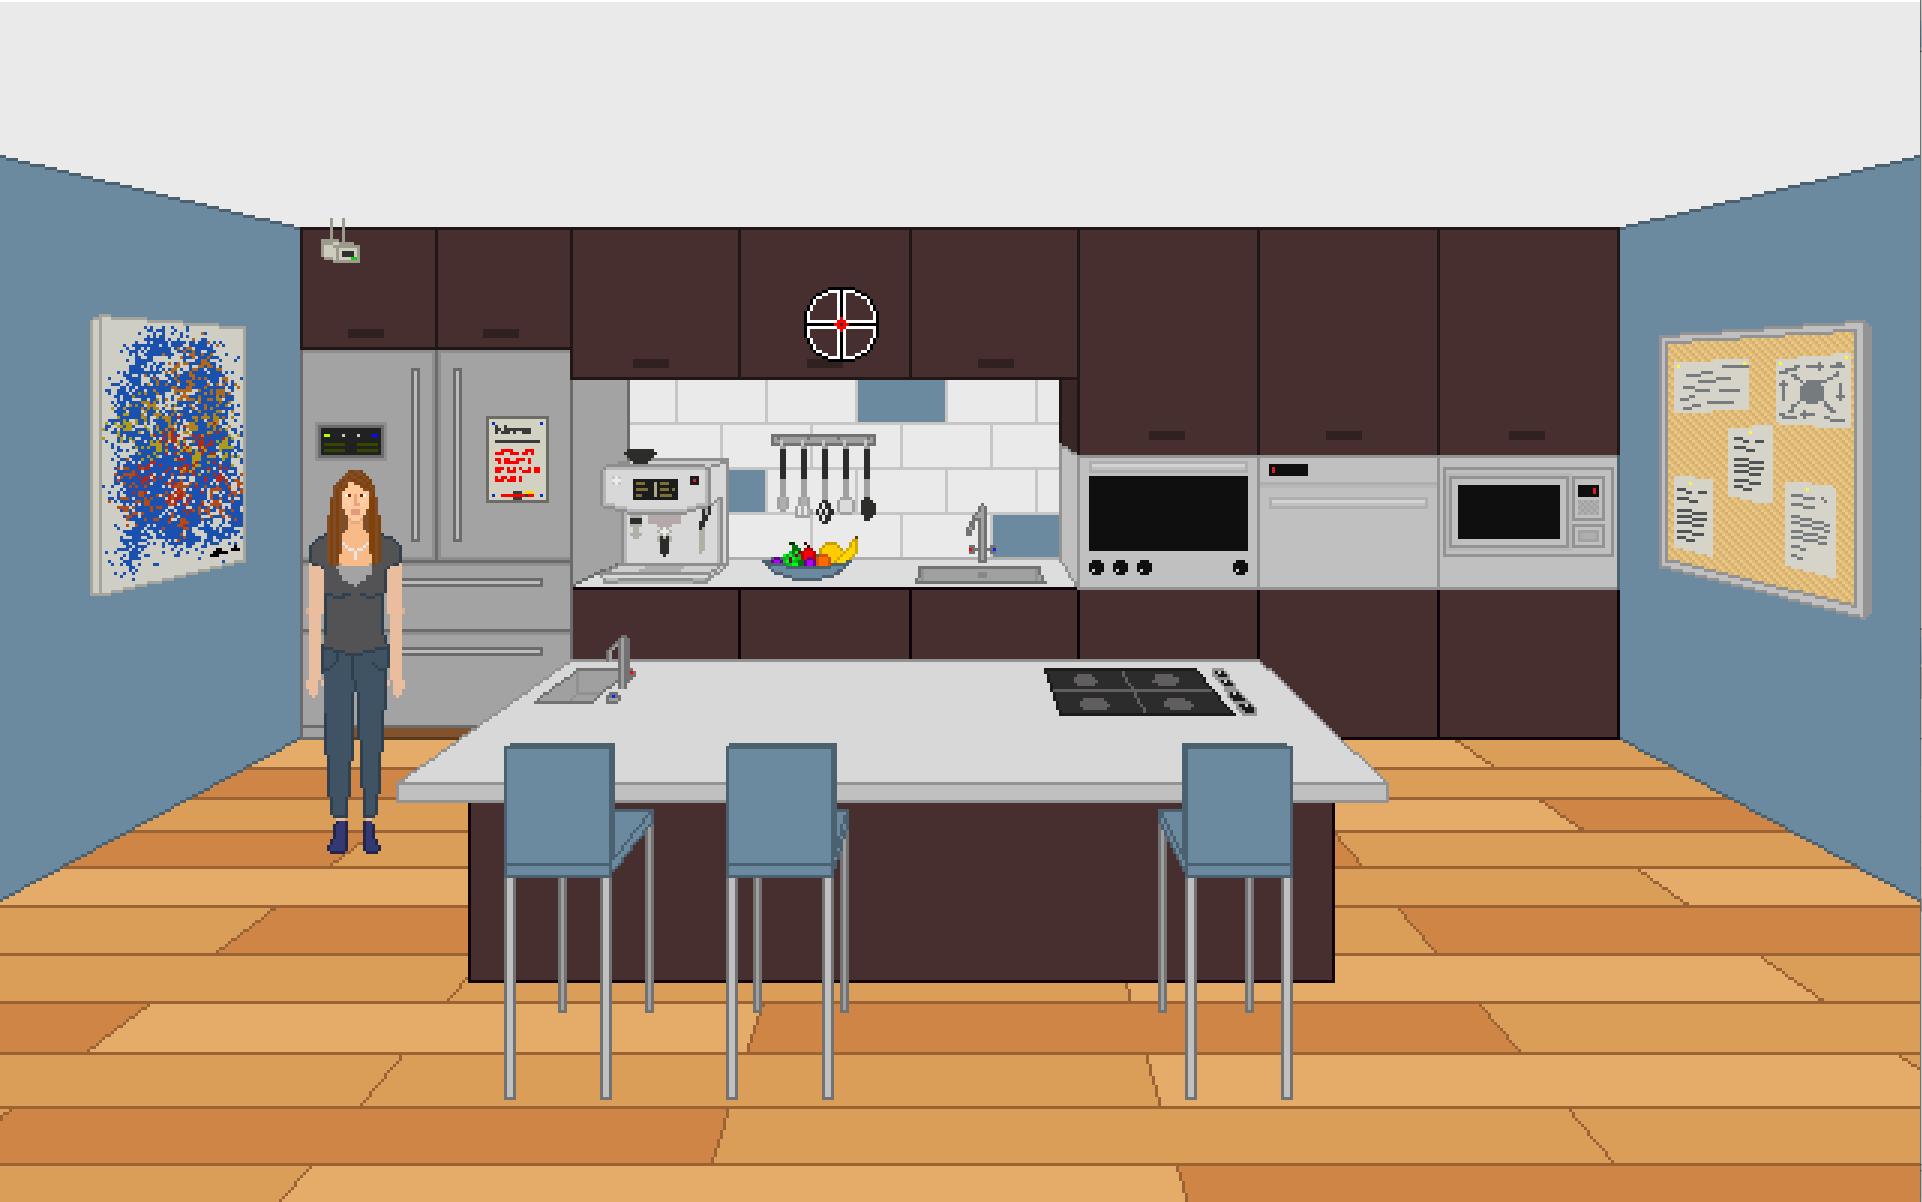 Screenshot 2 of The Penthouse width=